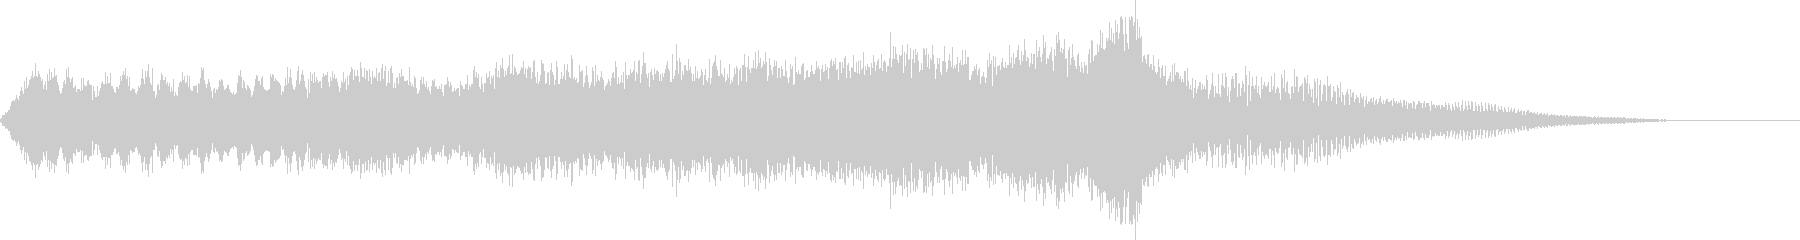 CINEMATIC RISER_13の未再生の波形